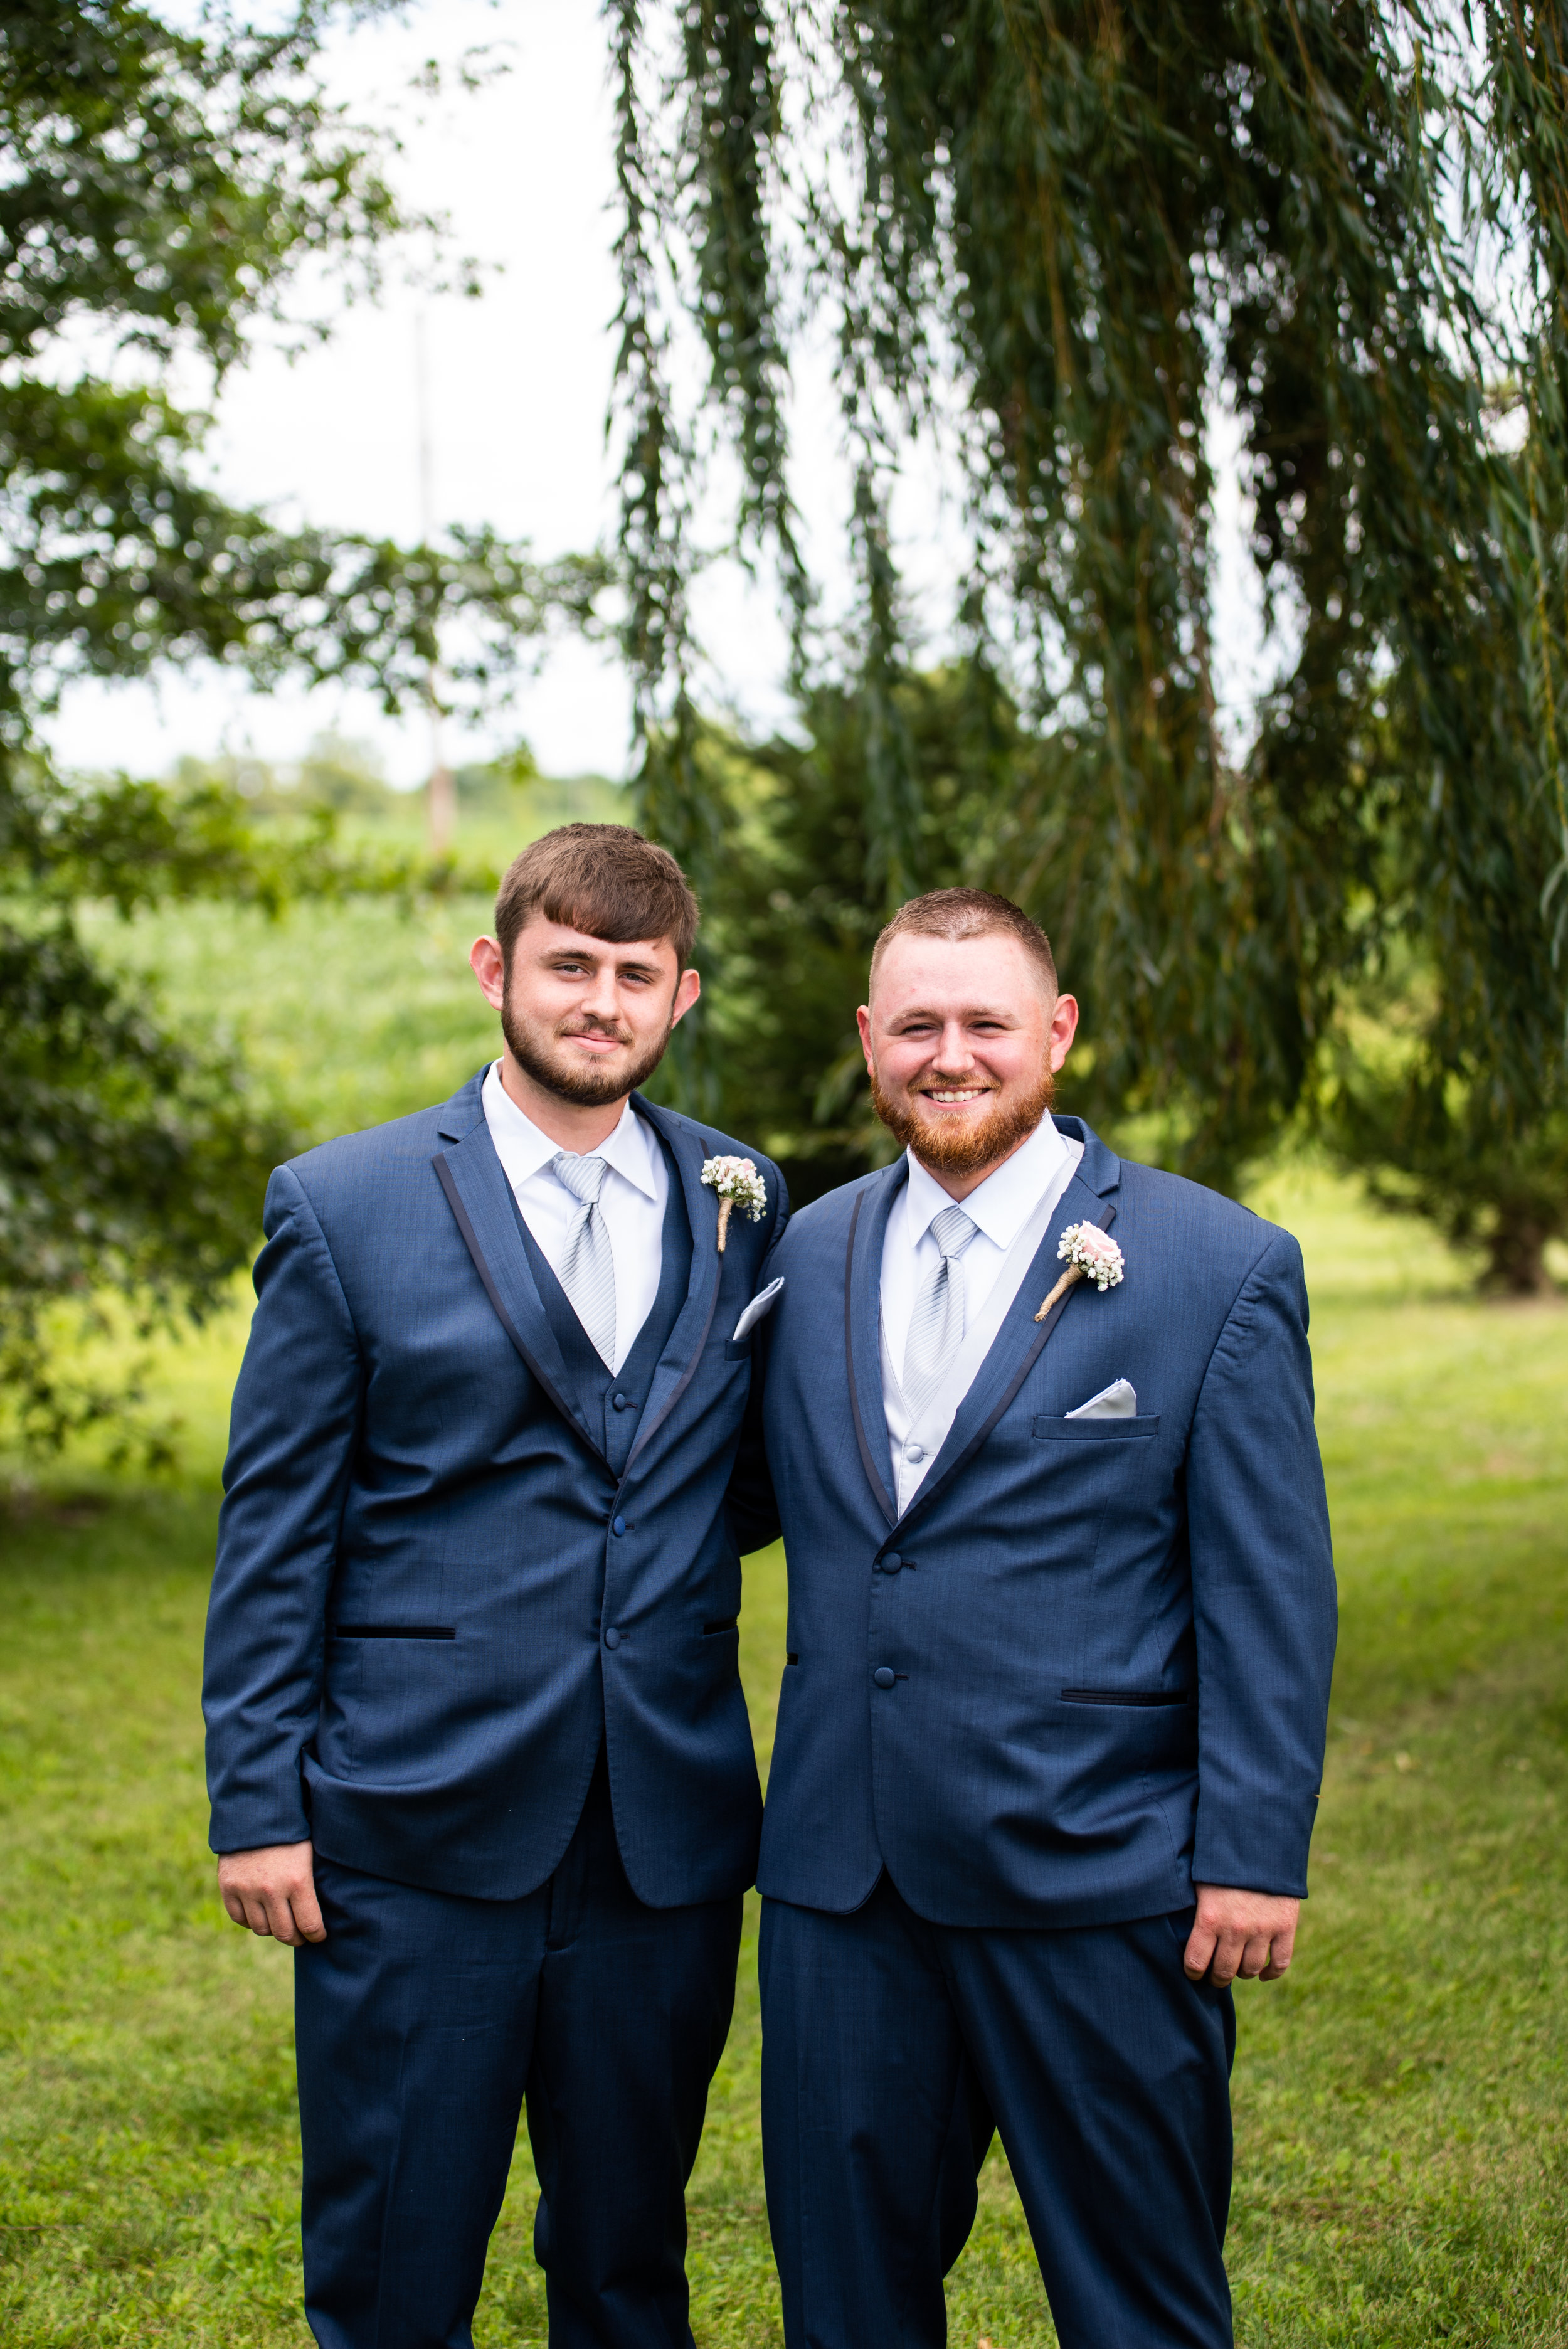 wedding (1 of 1)-53.jpg